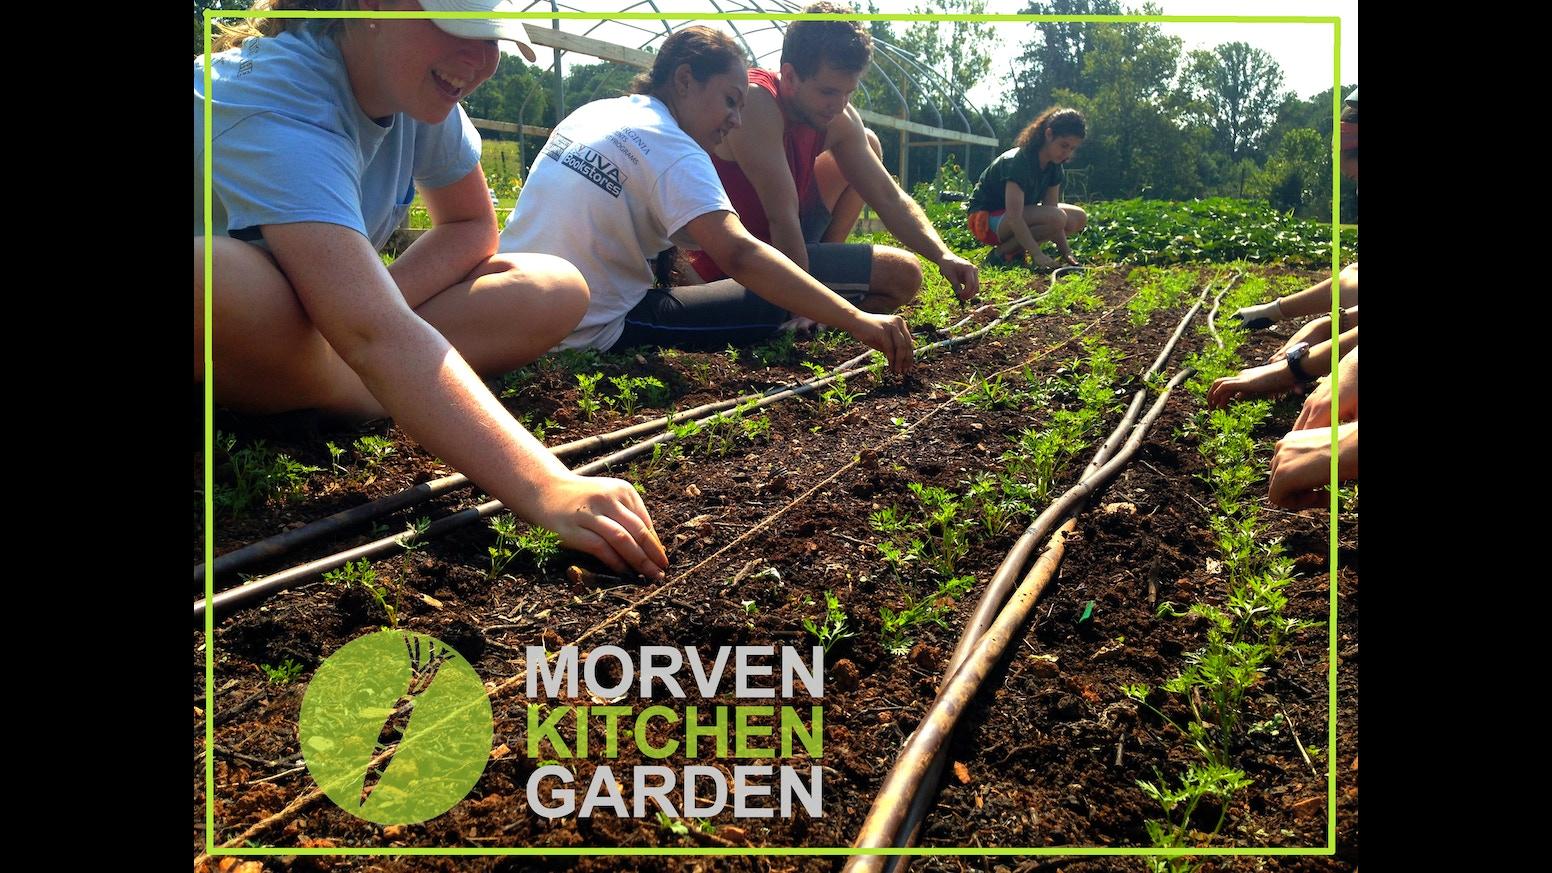 Kitchen Garden Farm The Morven Kitchen Garden Expand Rehabilitate Transform By